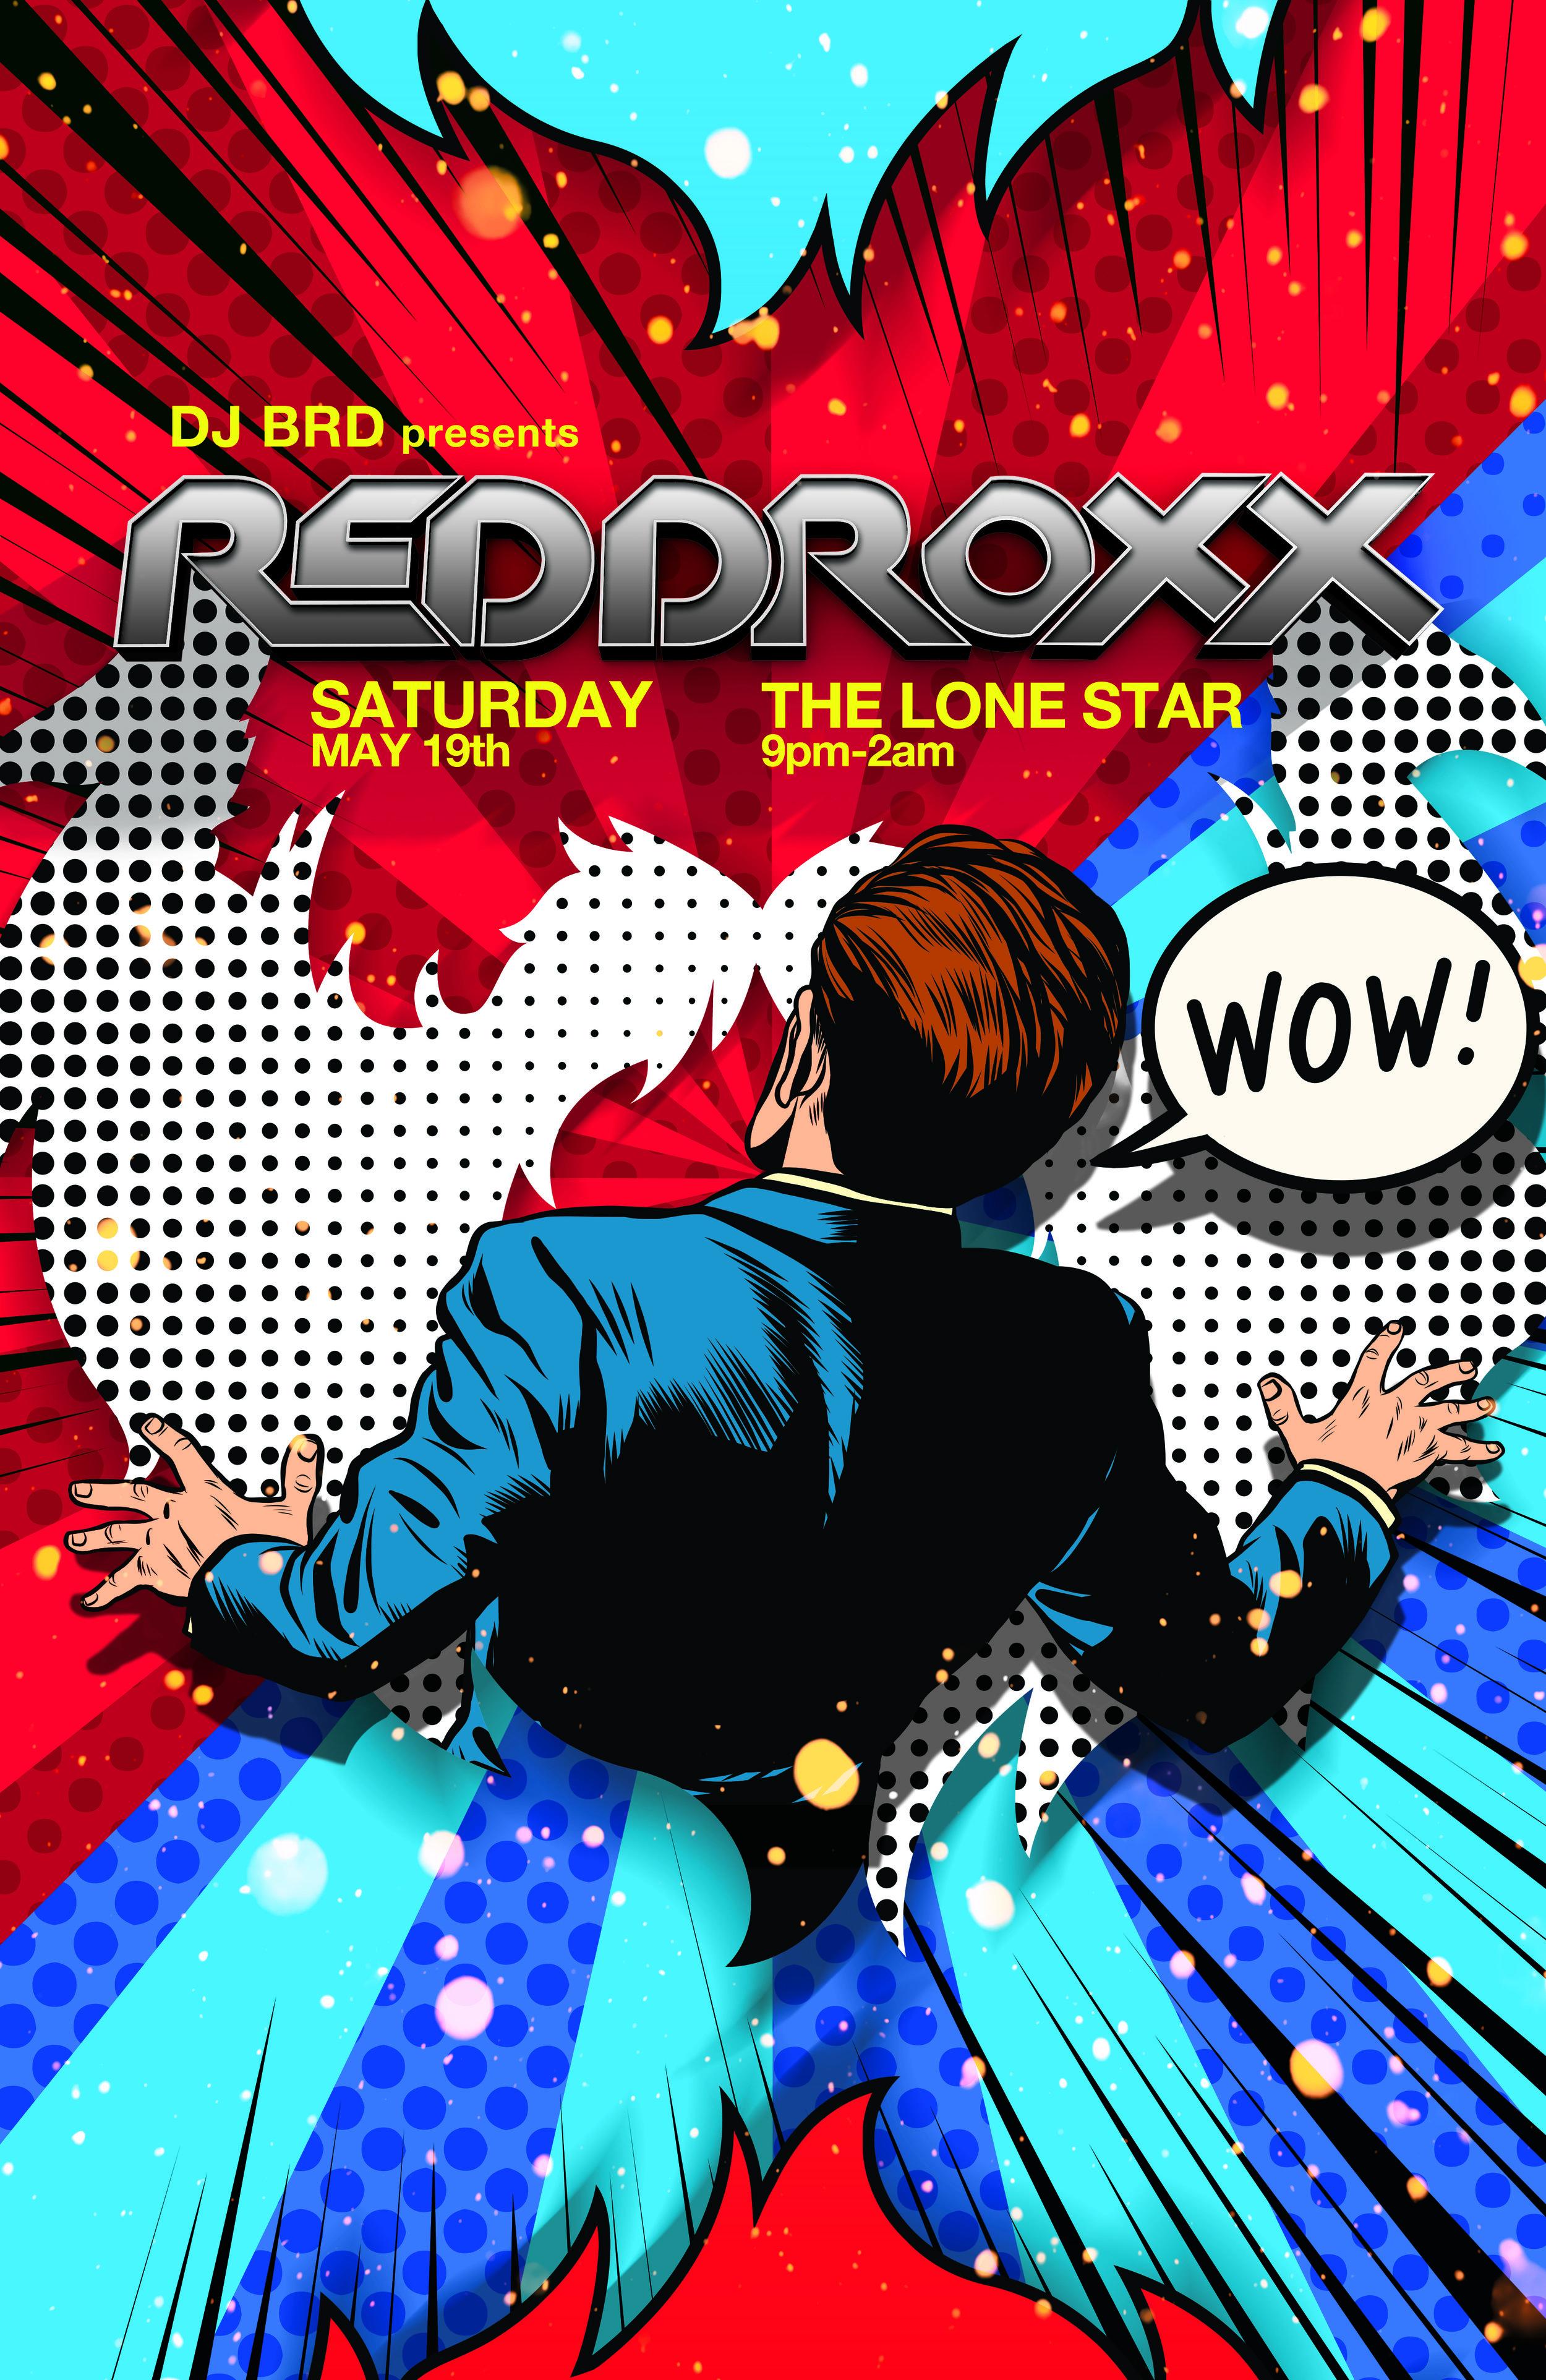 reddroxx_flyer73_11x17.jpg